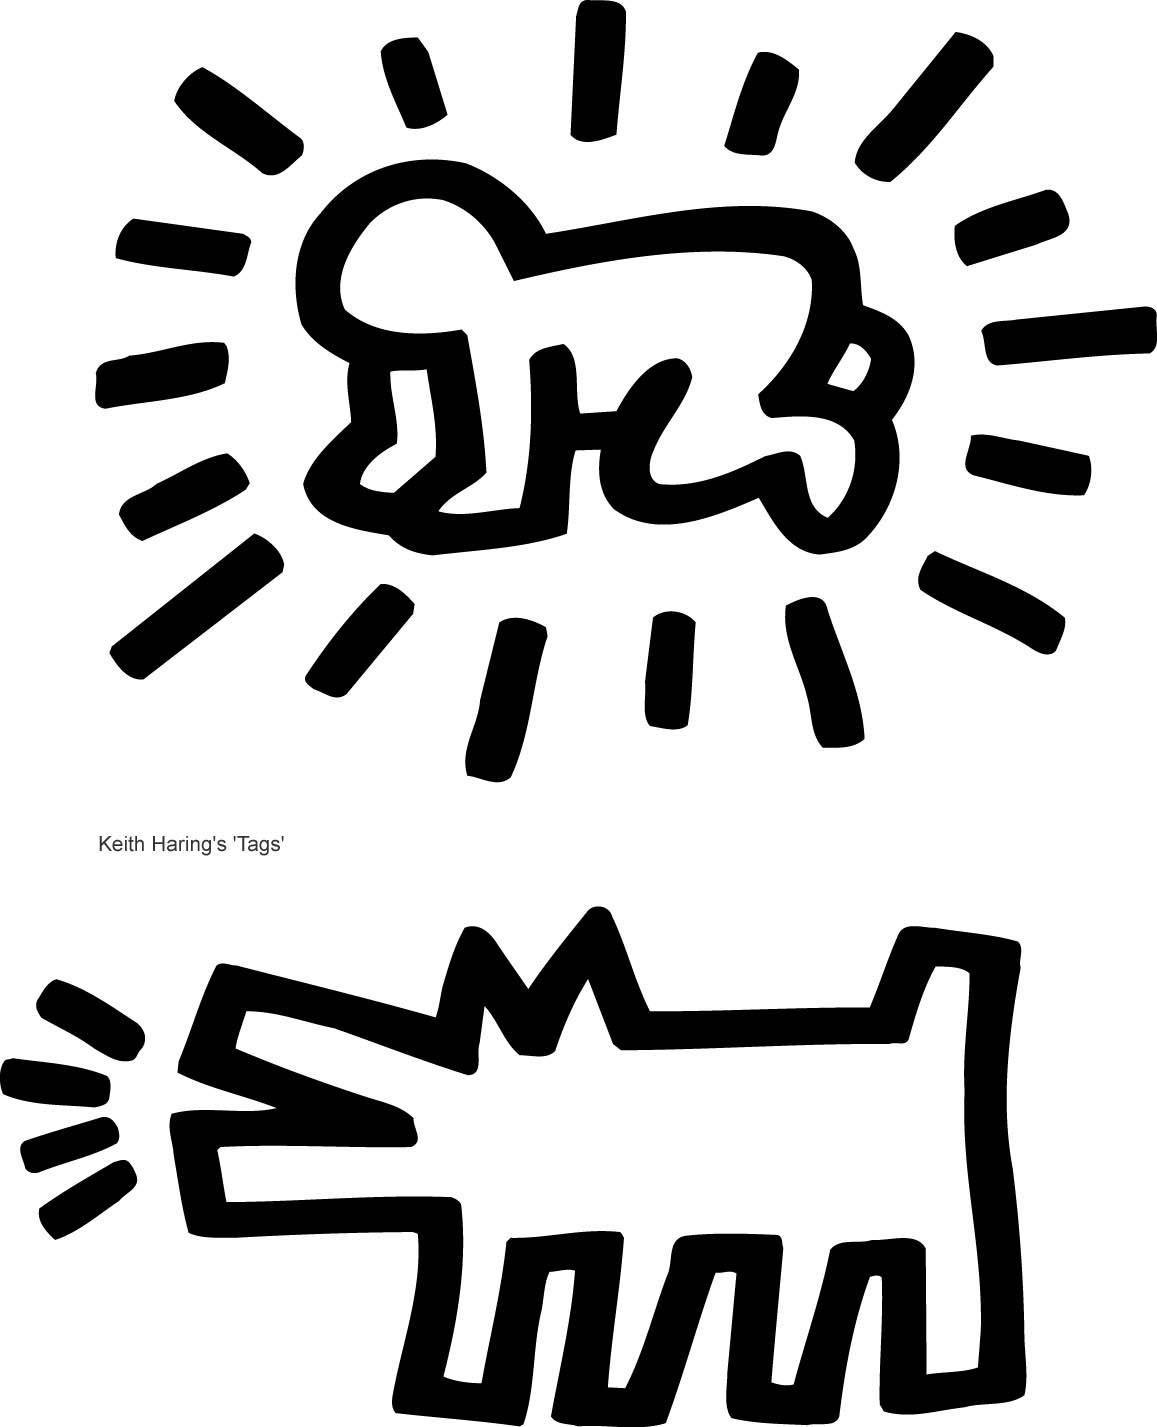 Keith Haring Colouring Pages Keith Haring Haring Art Keith